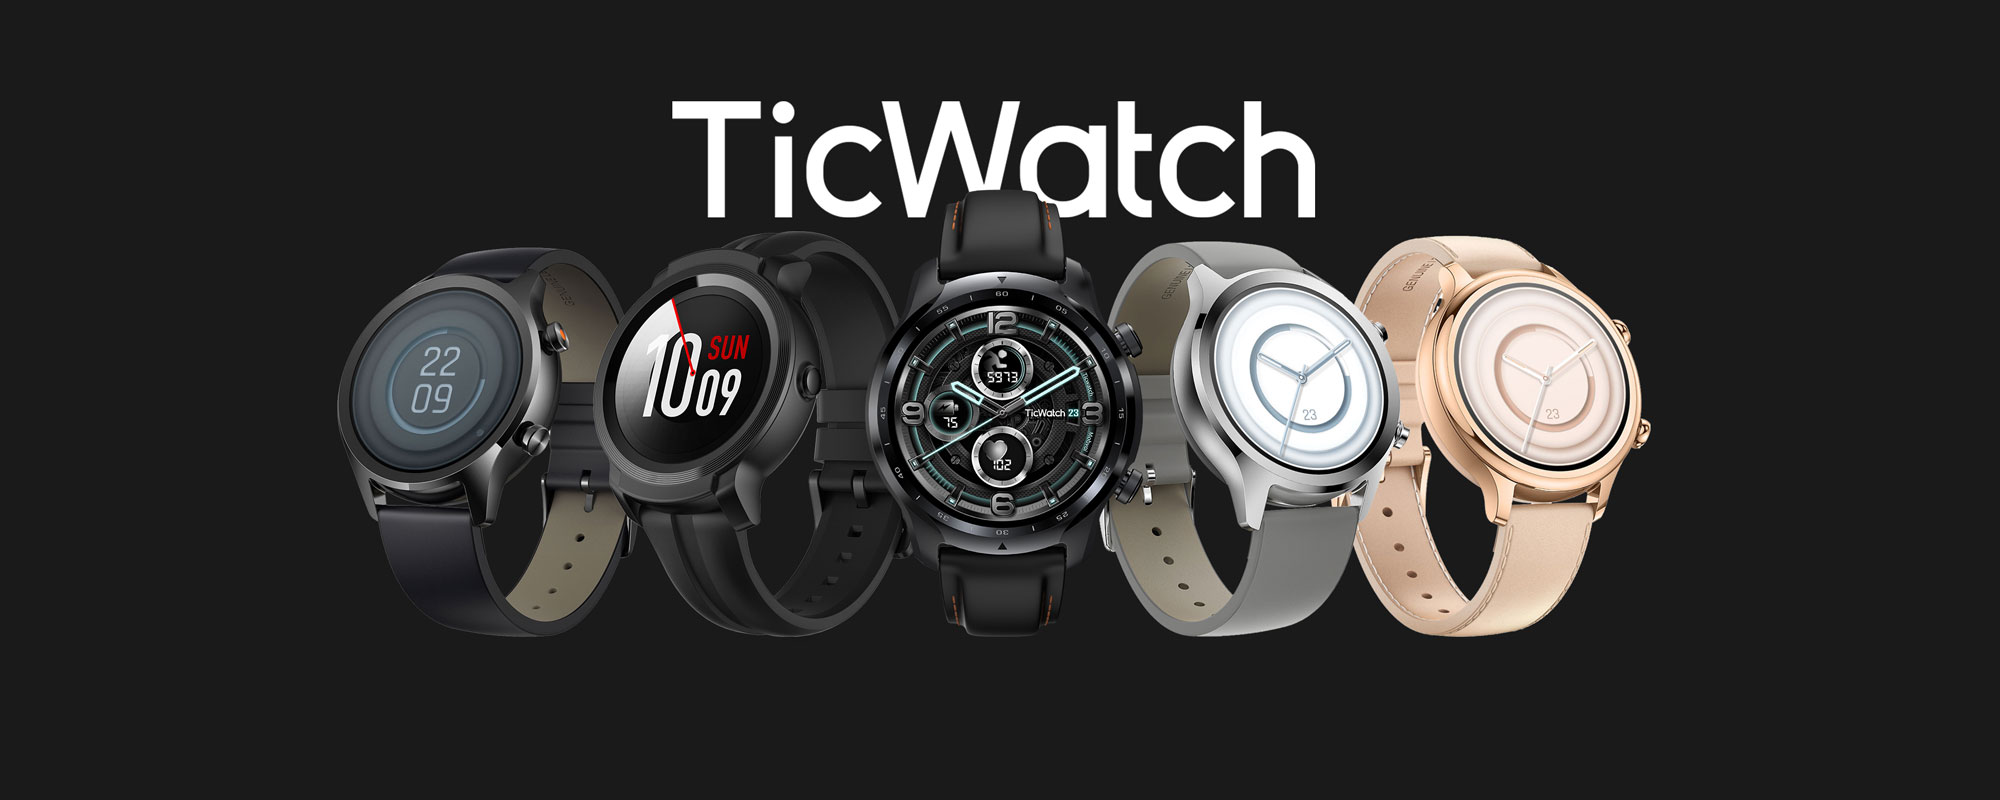 TicWatch-smart